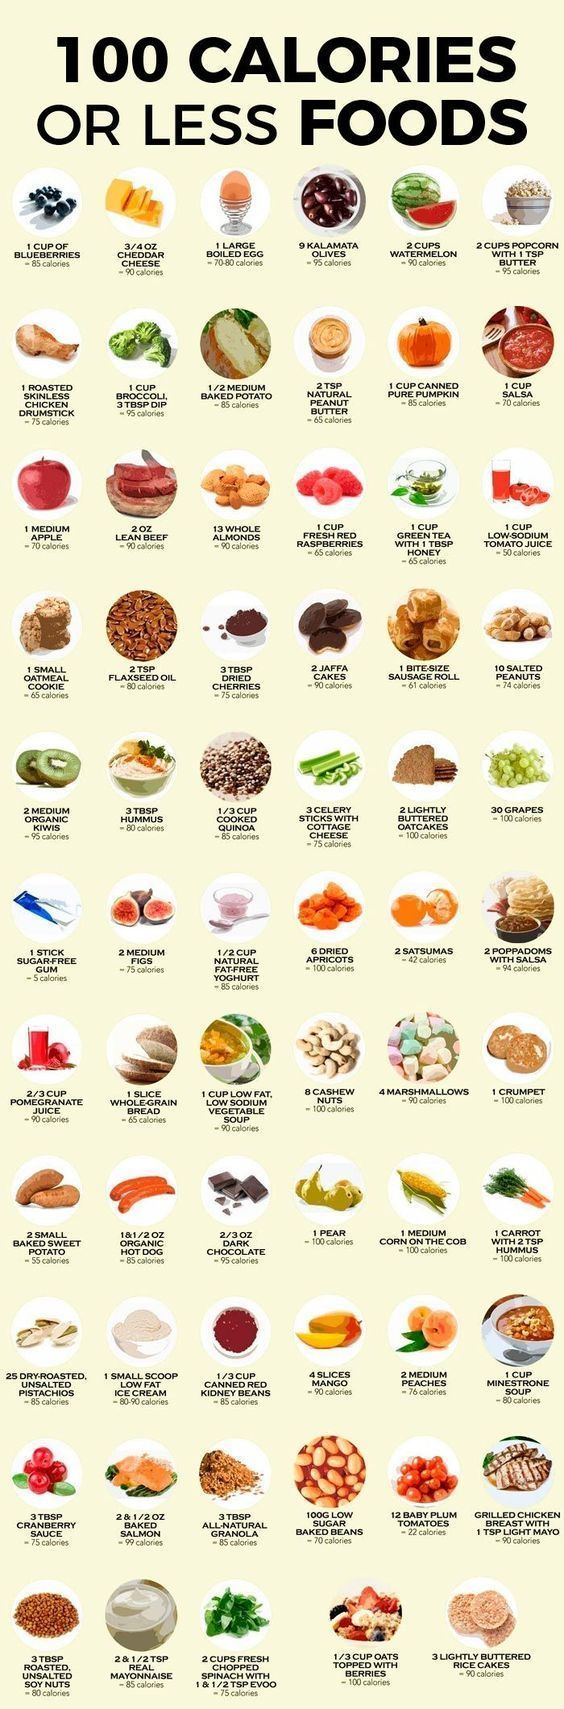 Cholesterol Exercise